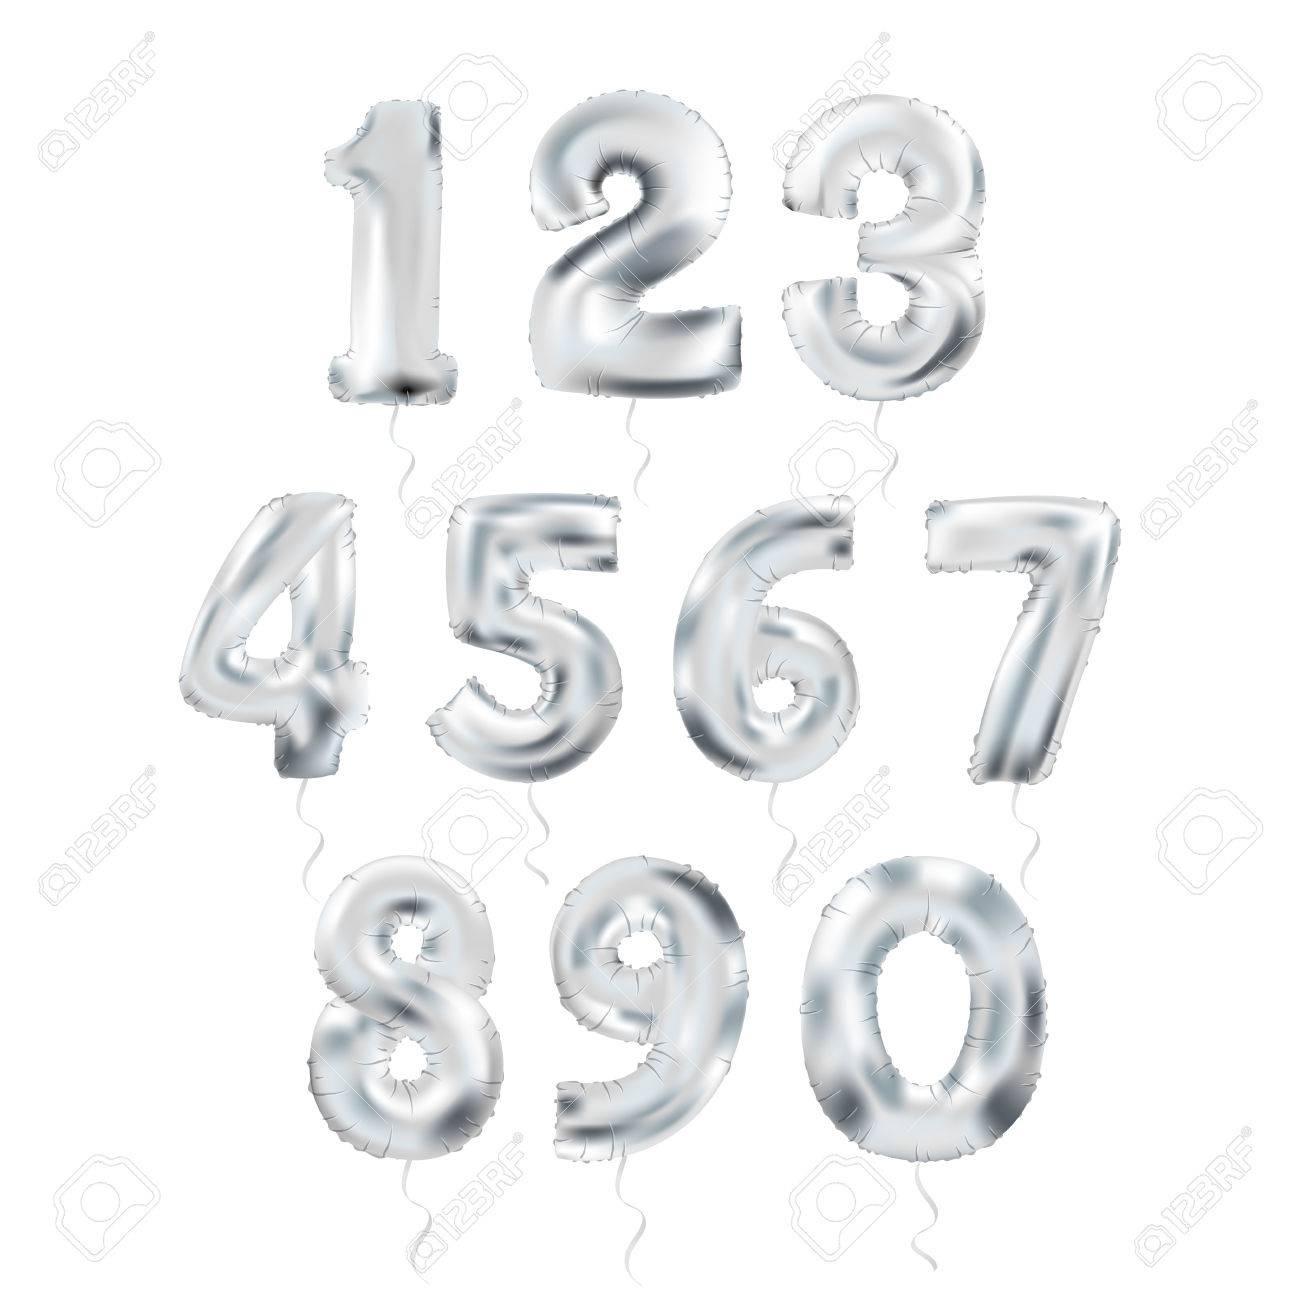 Metallic Silver Letter Balloons, 123 silvern numeral alphabeth. Silver Number Balloons, 1, Alphabet Letter Balloons, 2, Number Balloons, 3 Air Filled Balloon - 66824952